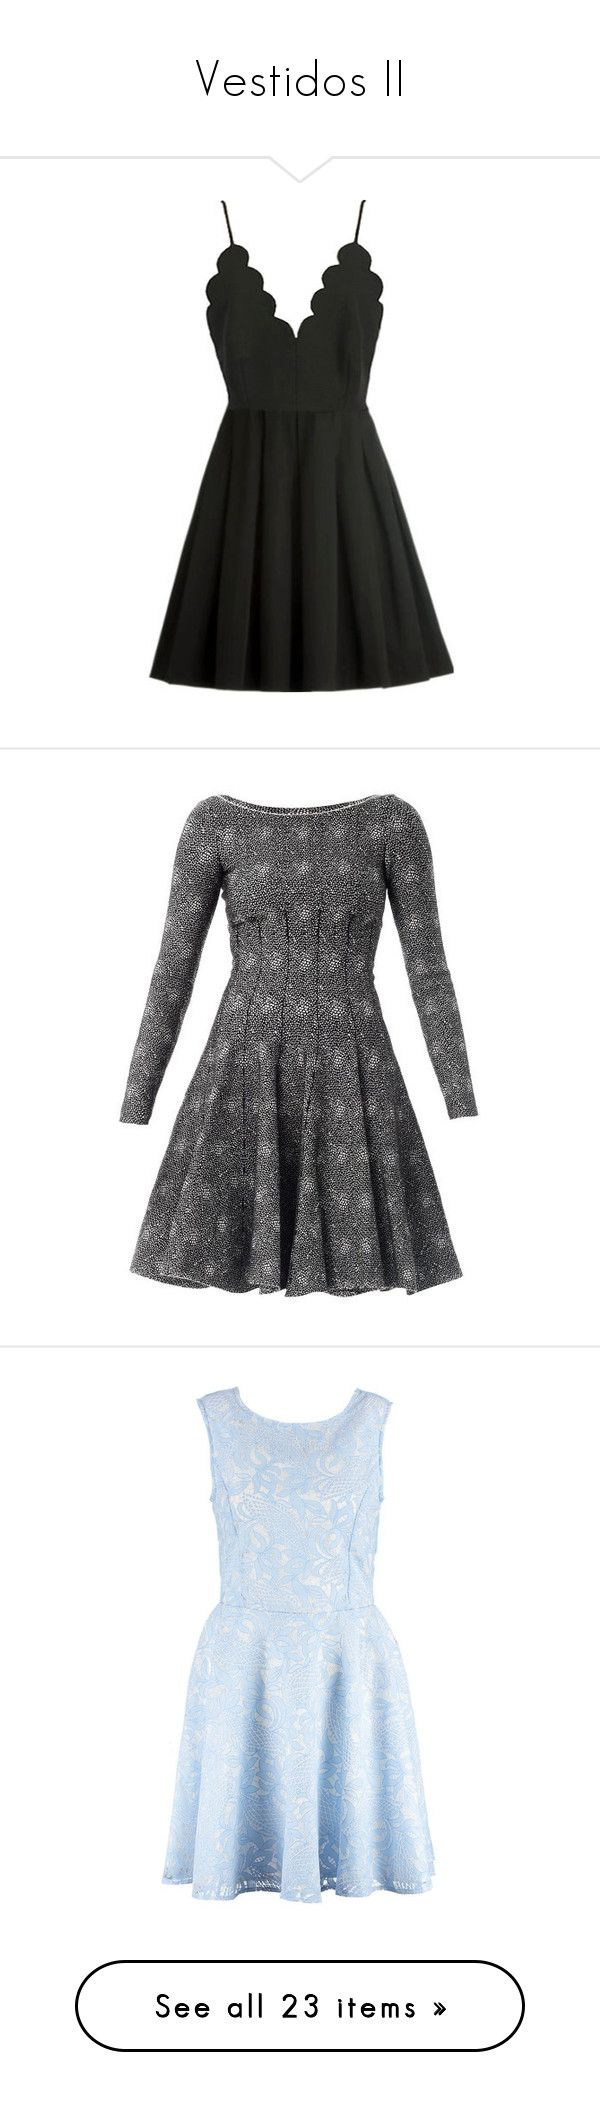 """Vestidos II"" by barbarapalvine22 ❤ liked on Polyvore featuring dresses, vestidos, zip back dress, pleated a line dress, scallop trim dress, back zipper dress, spaghetti strap dress, black, polka dot skater skirt and spotty dress"